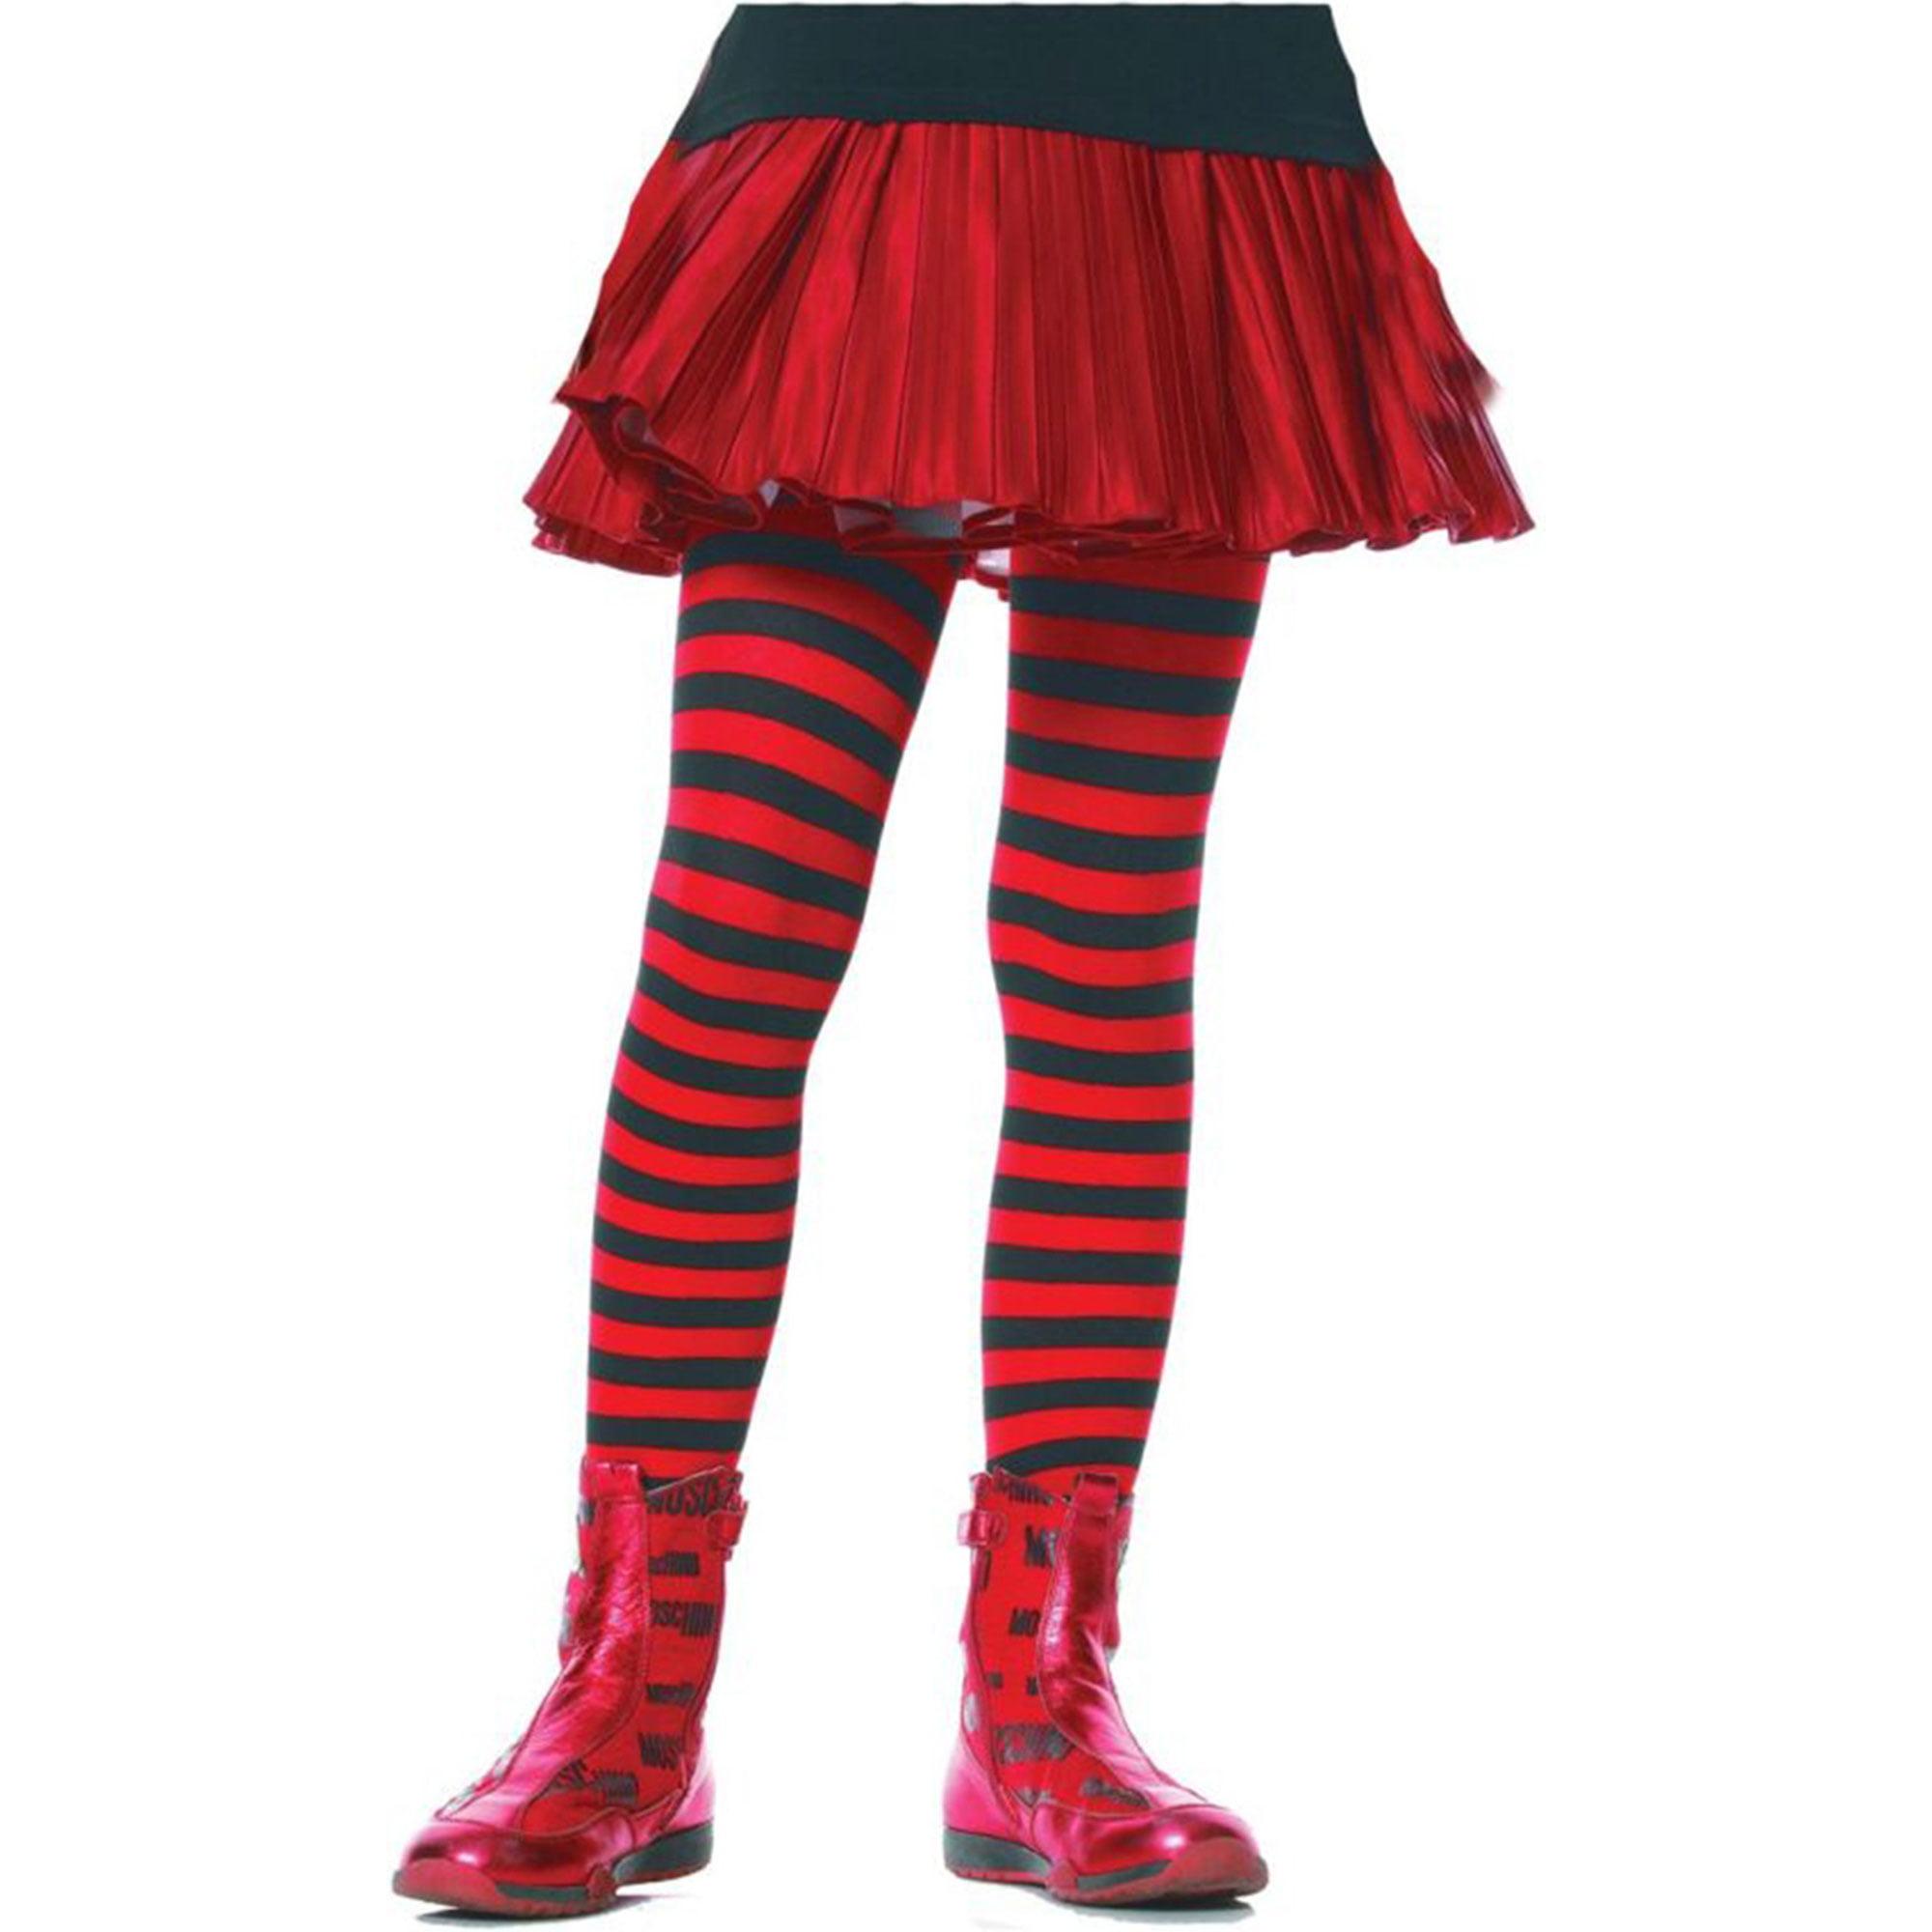 Morris Costumes Tights Chld Striped Bk/Rd 7-10